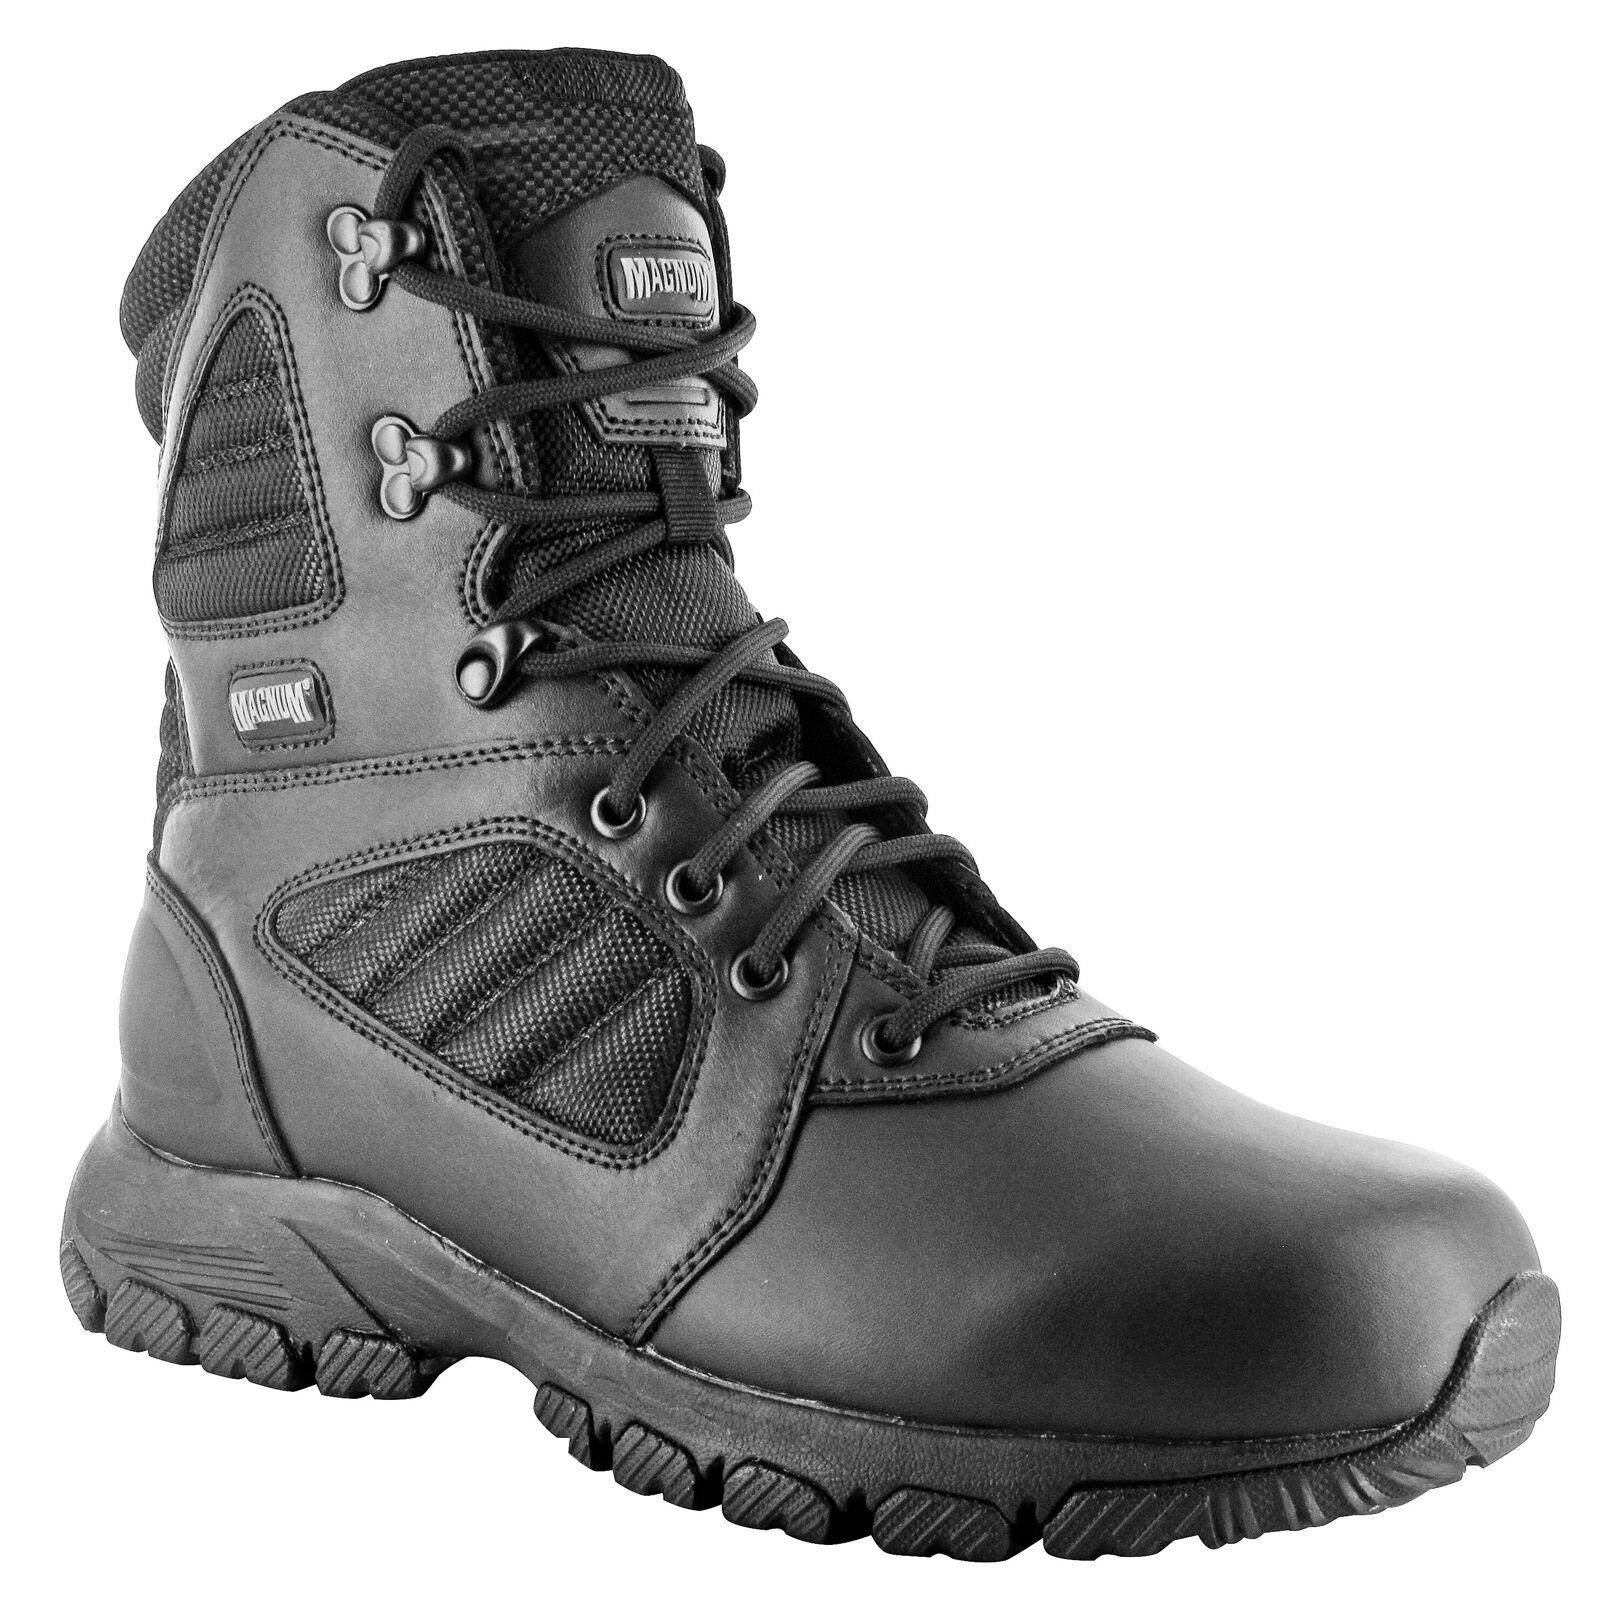 Hi-Tec - Magnum Lynx 8.0 BLACK Side Zip shoes Men's Boots Ranger Security Poli